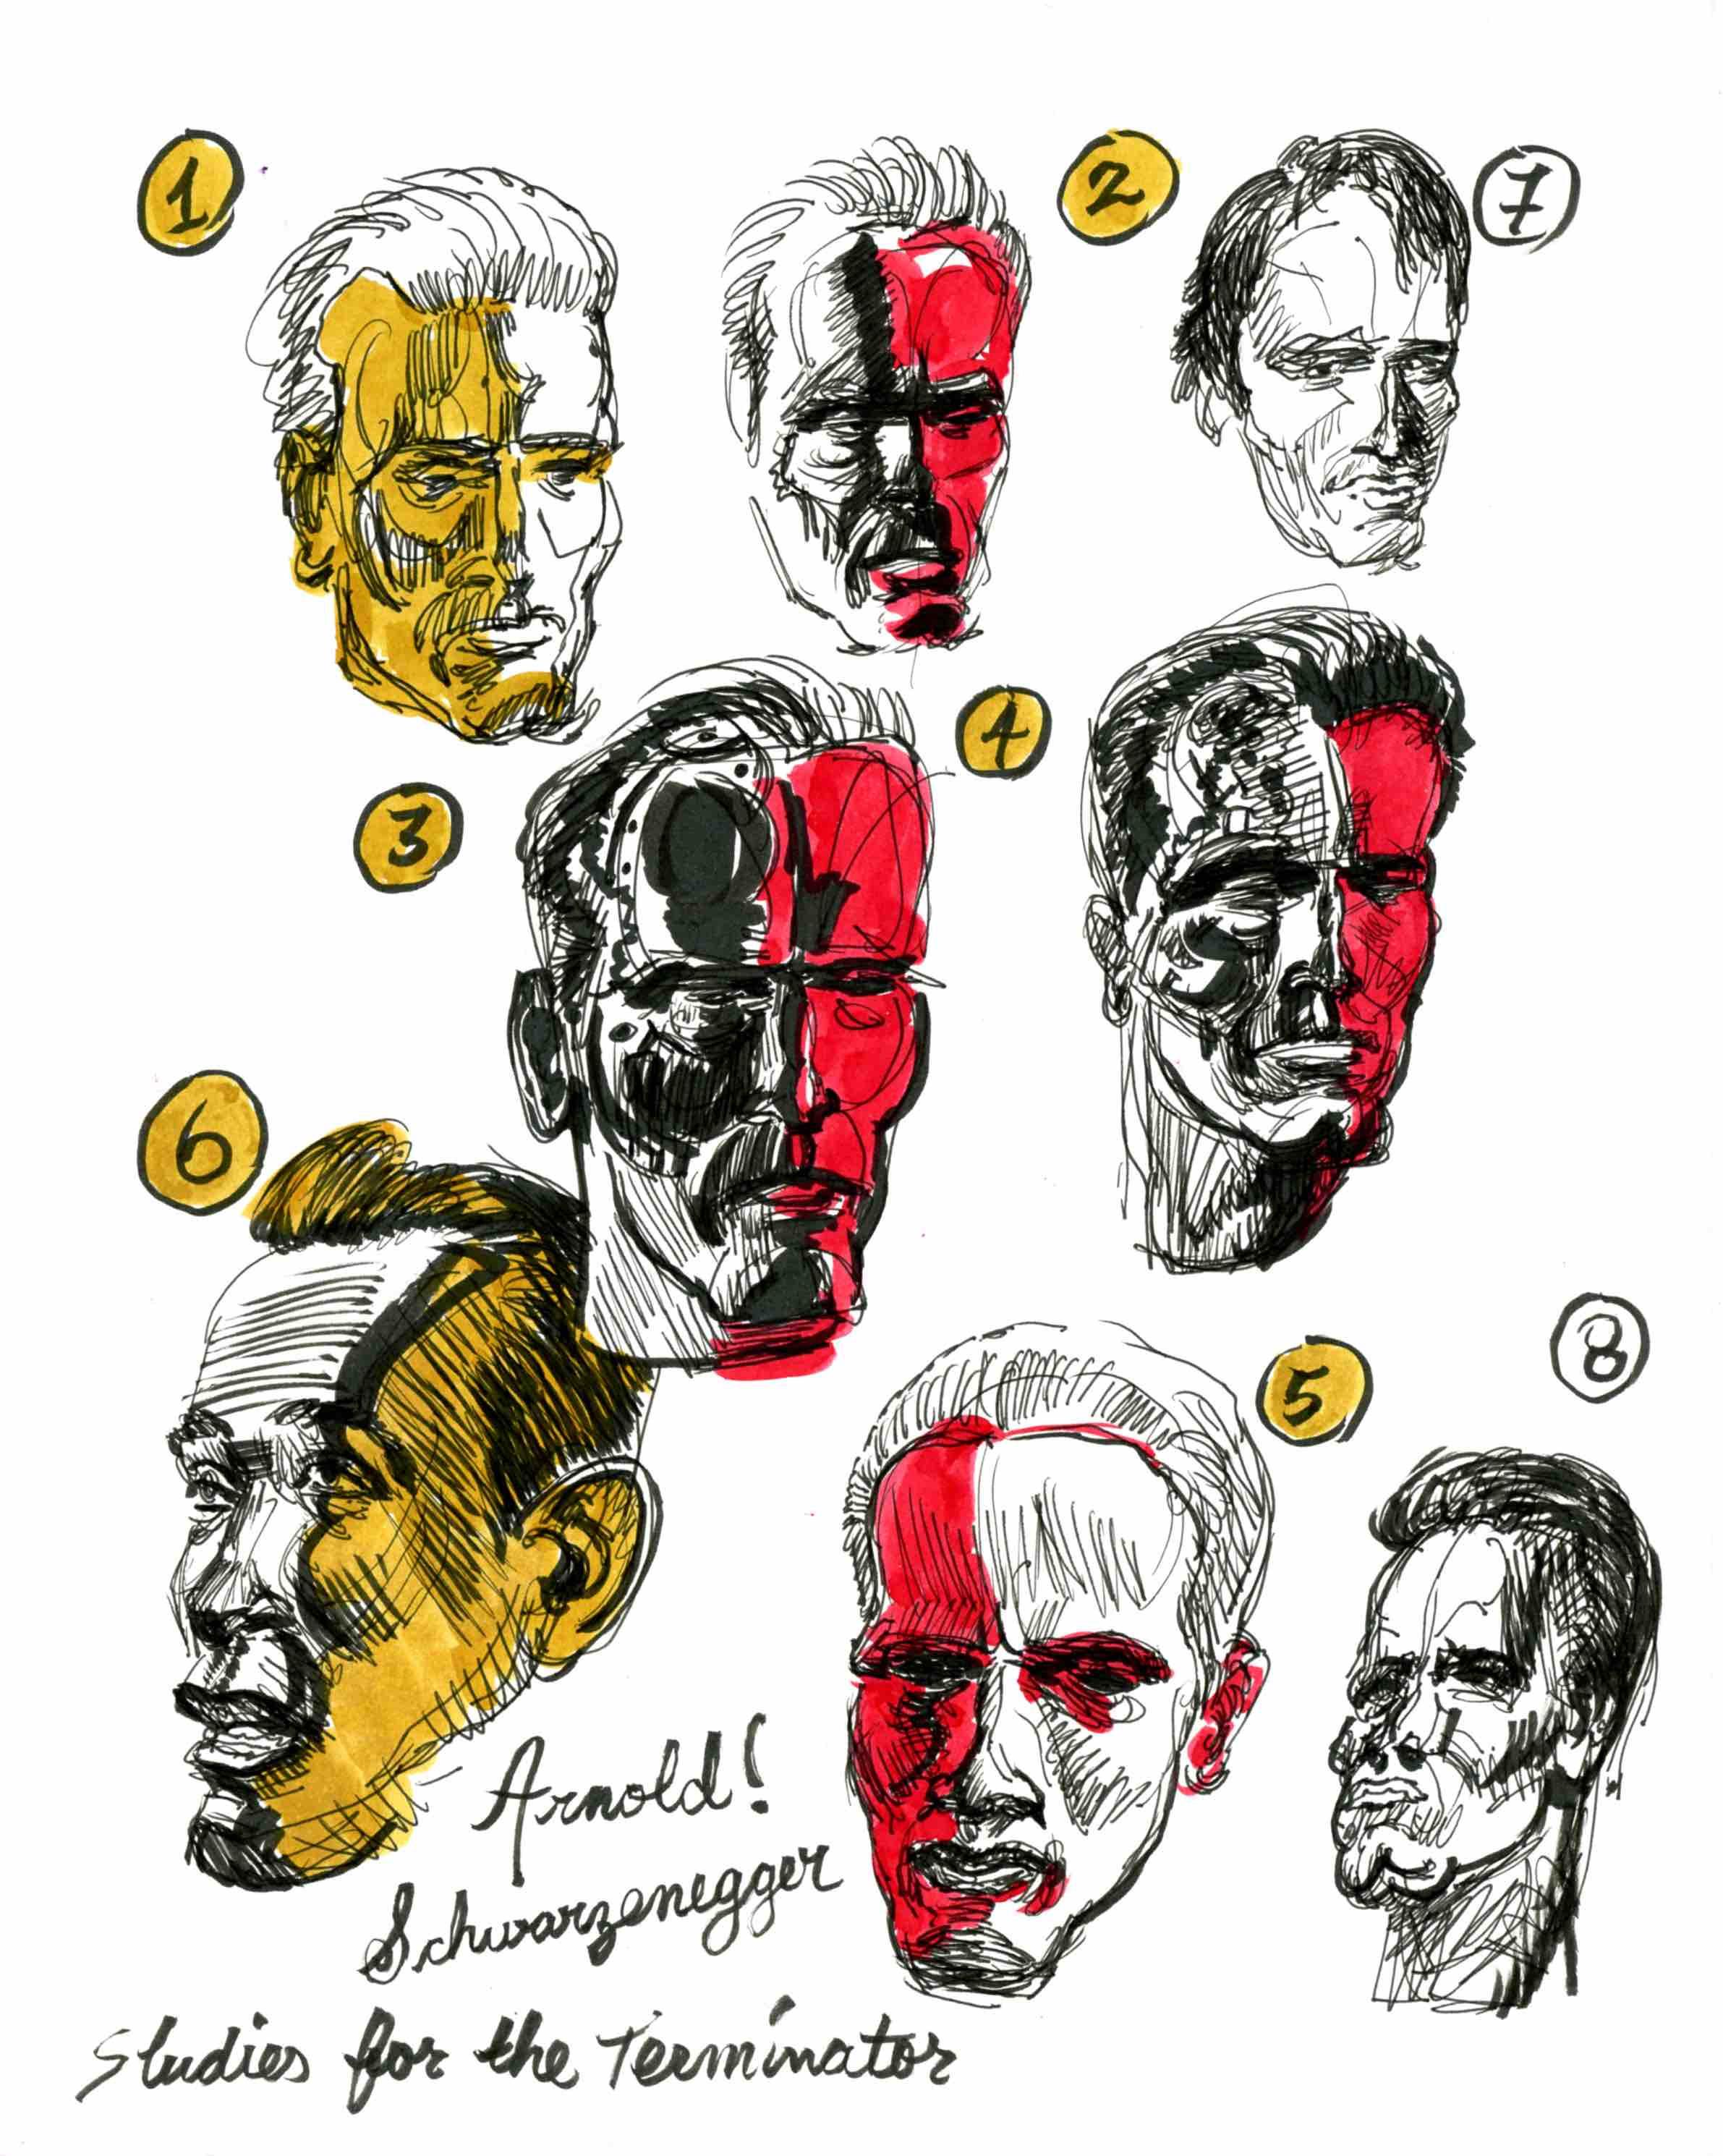 Head studies. I gave Arnold, that Frankenstein look.